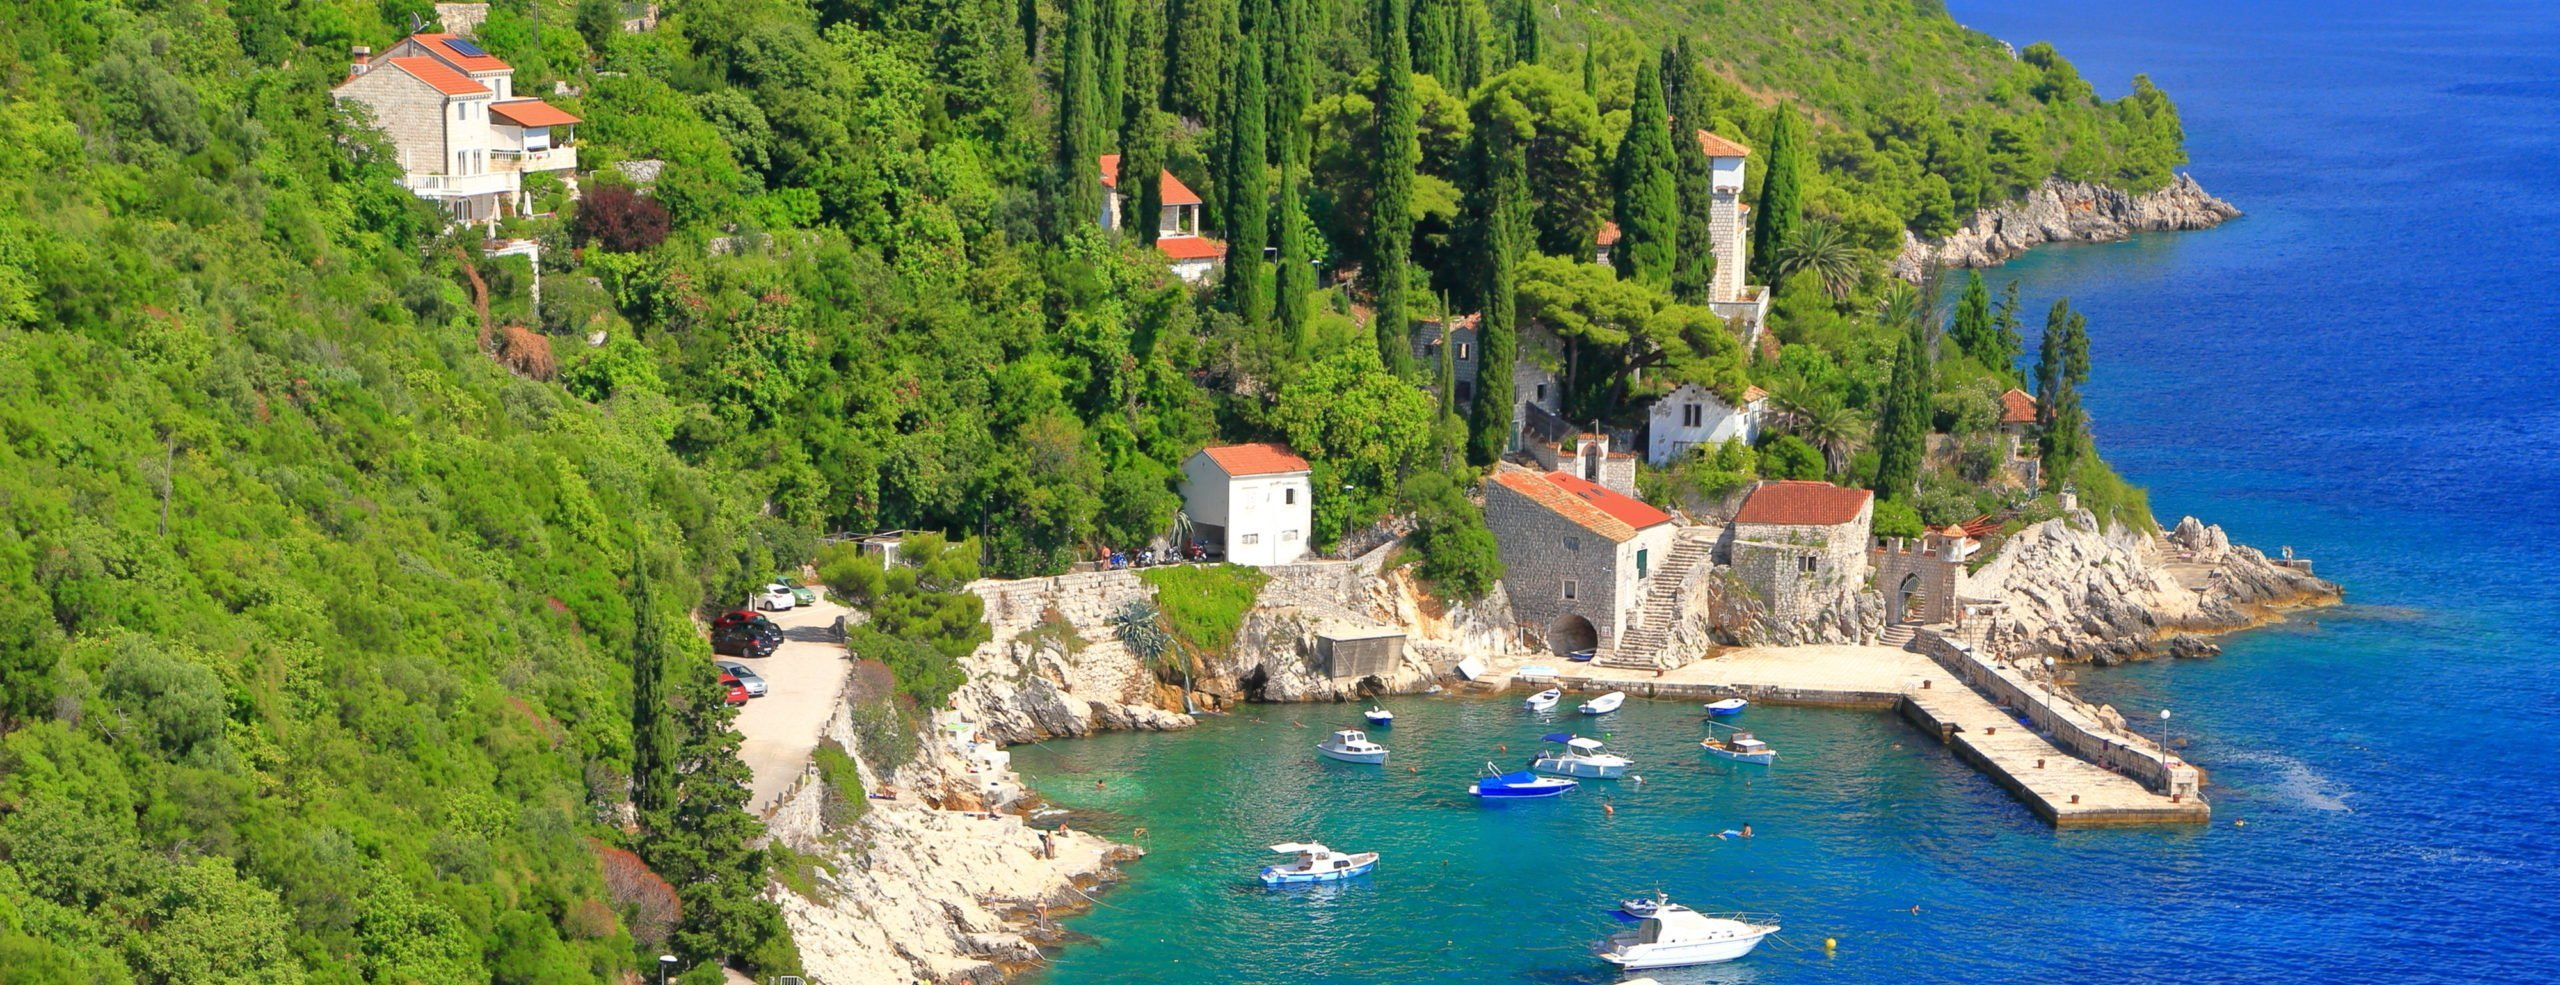 Dalmatian-coast-travel